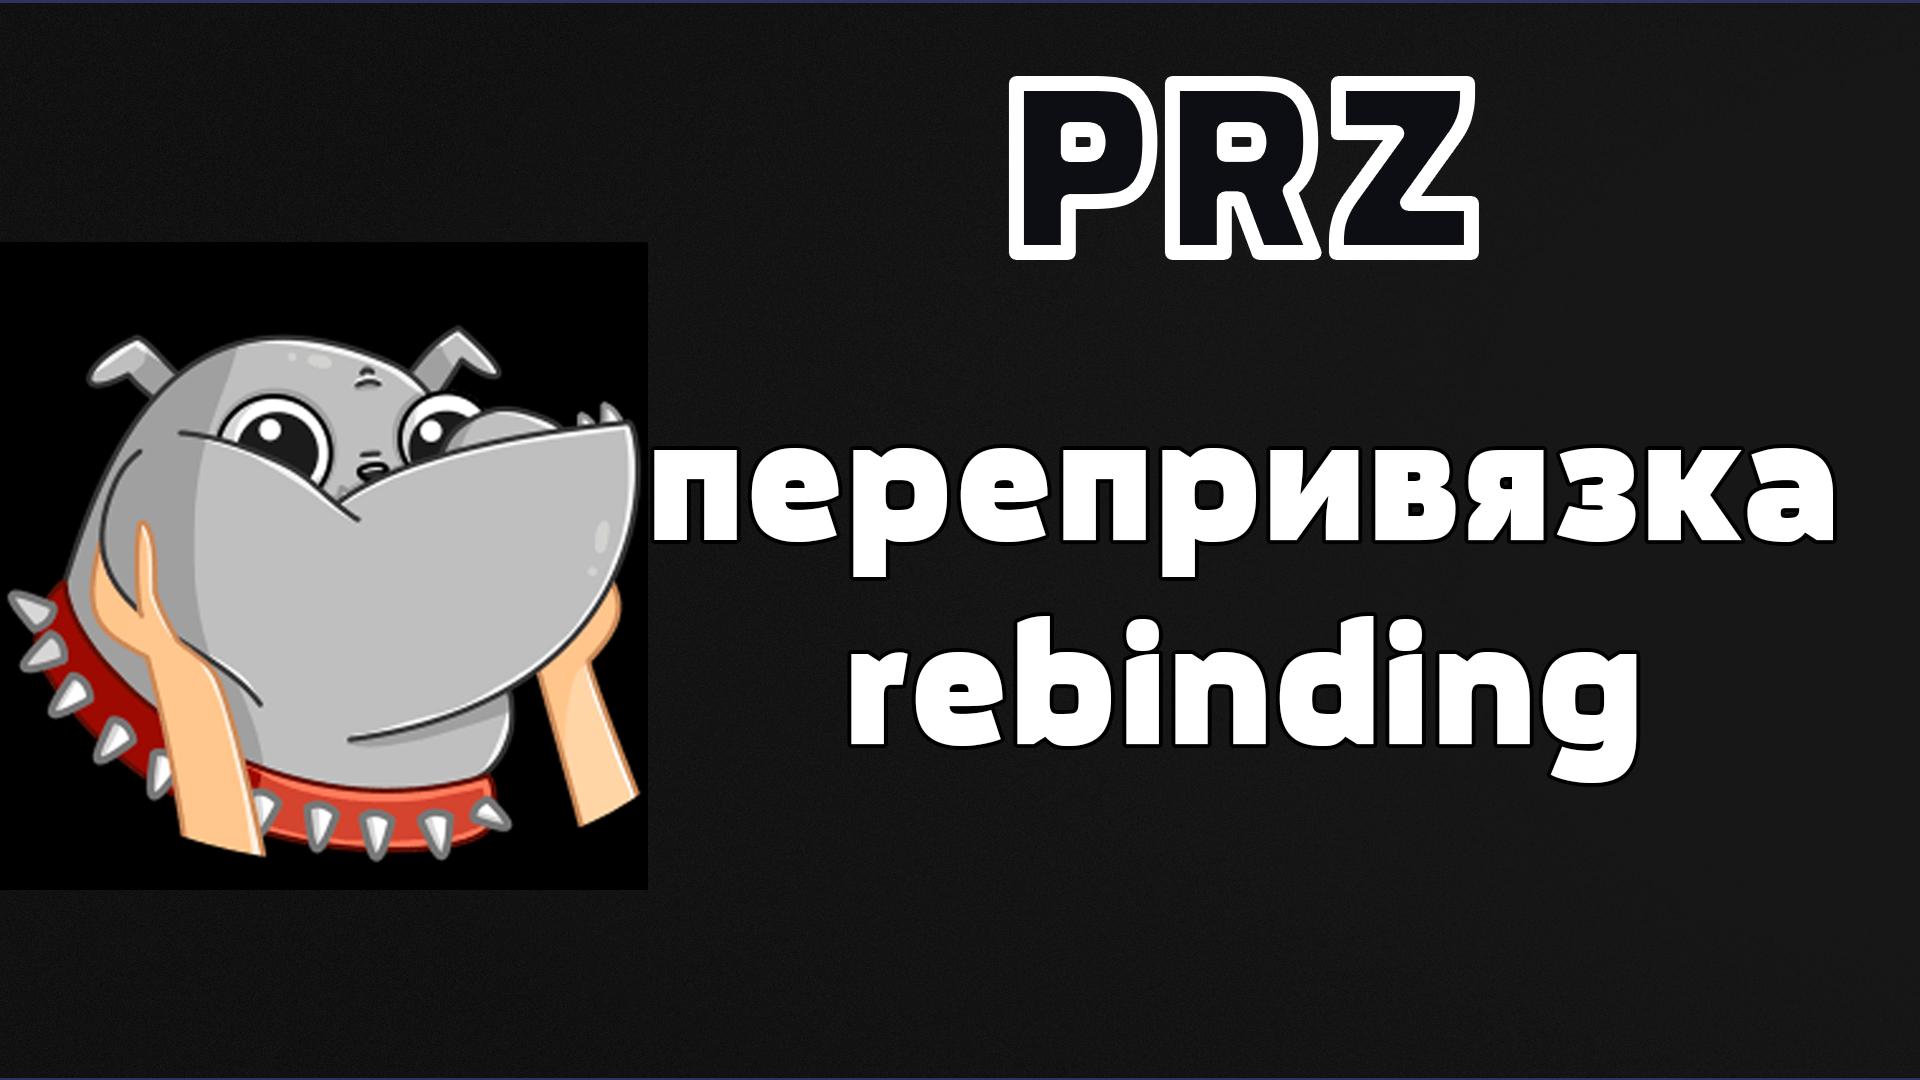 PRZ - Parser reestr-zalogov - перепривязка